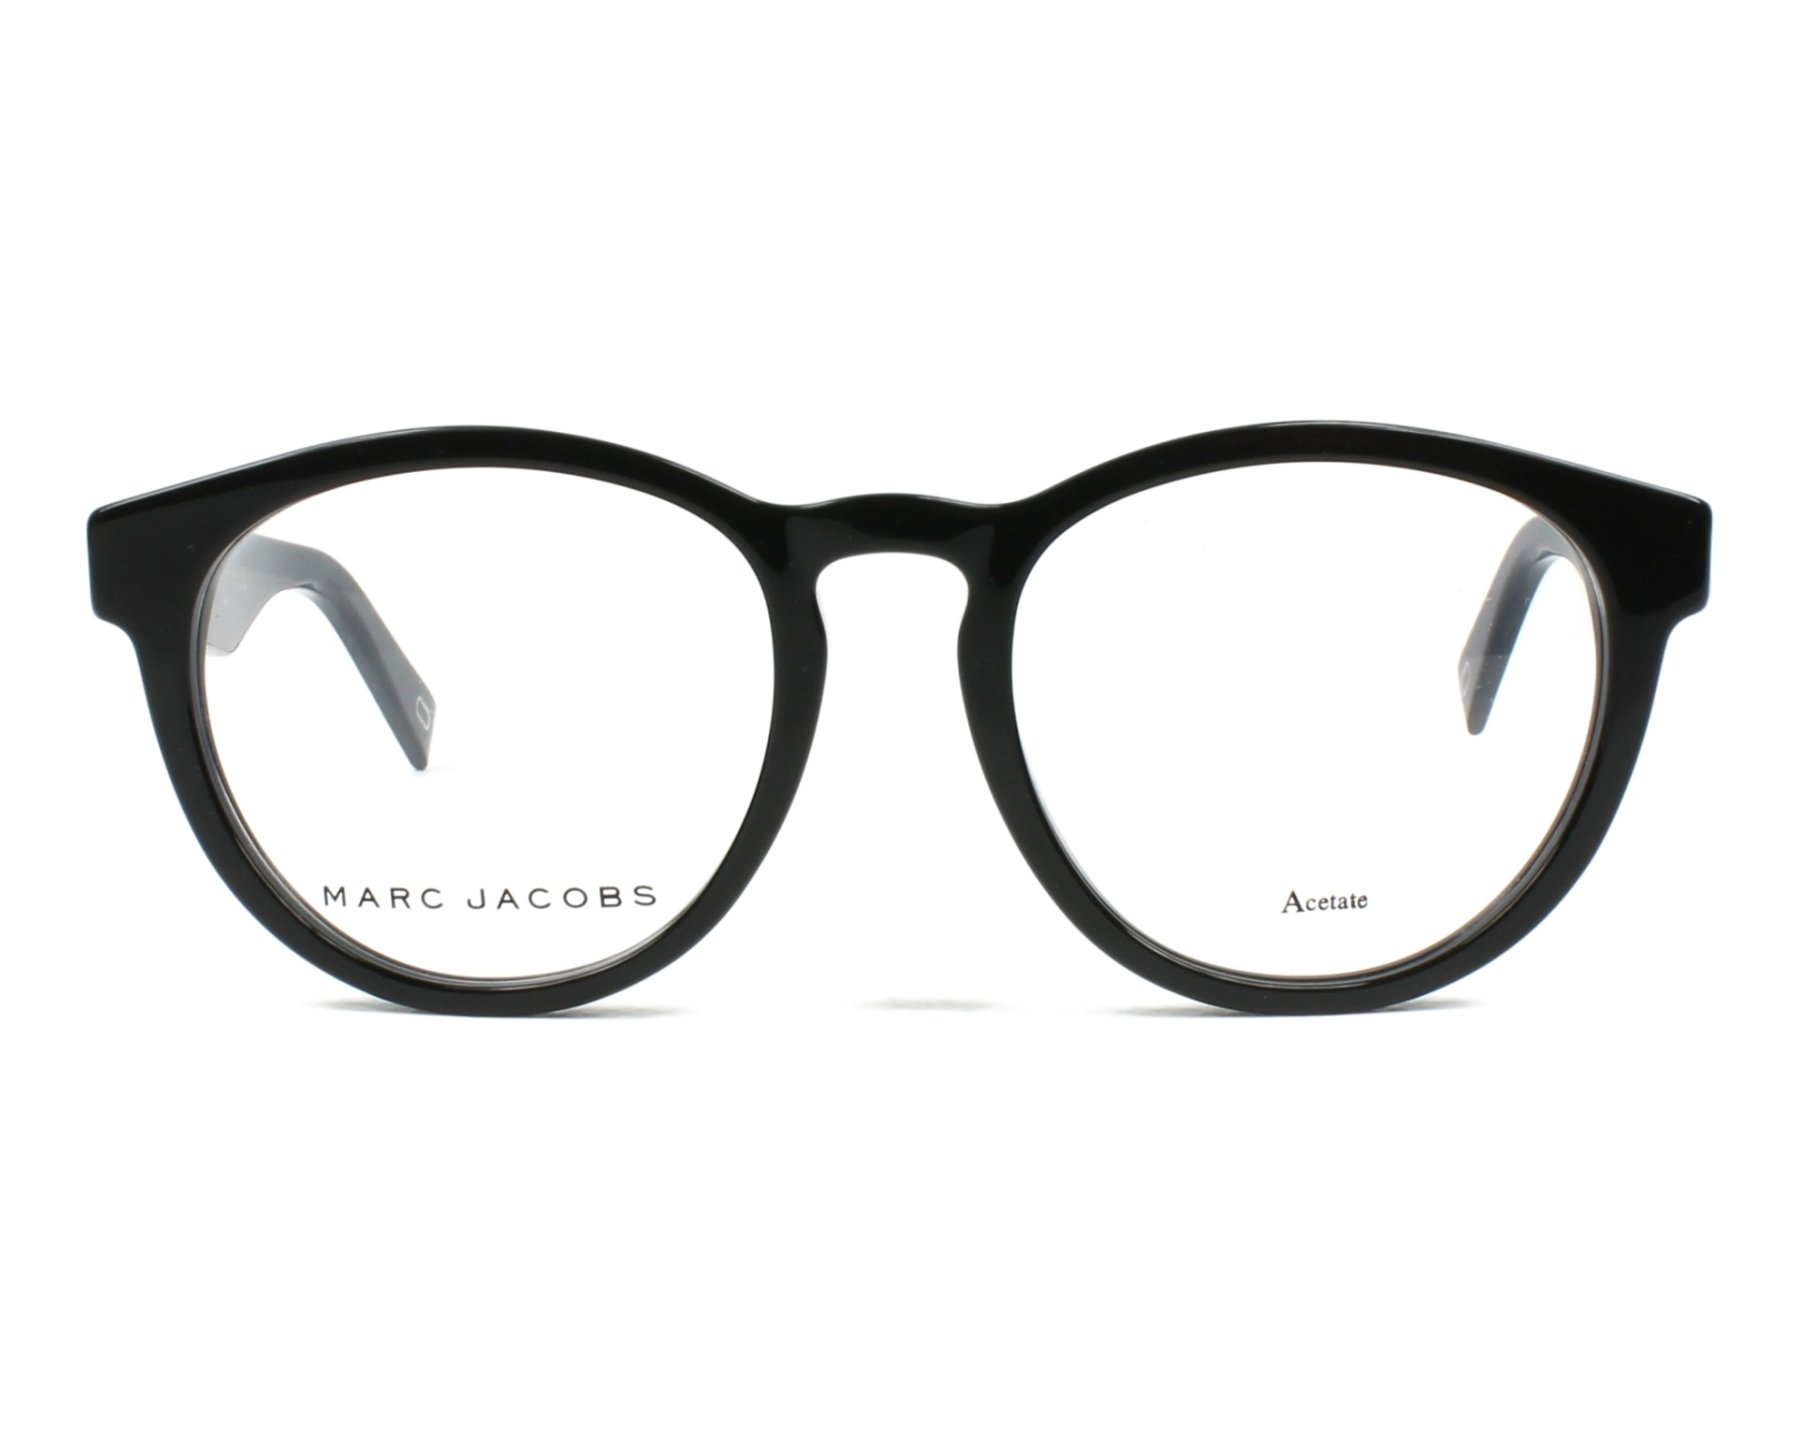 906a94083cf7 eyeglasses Marc Jacobs MARC-237 807 - Black front view